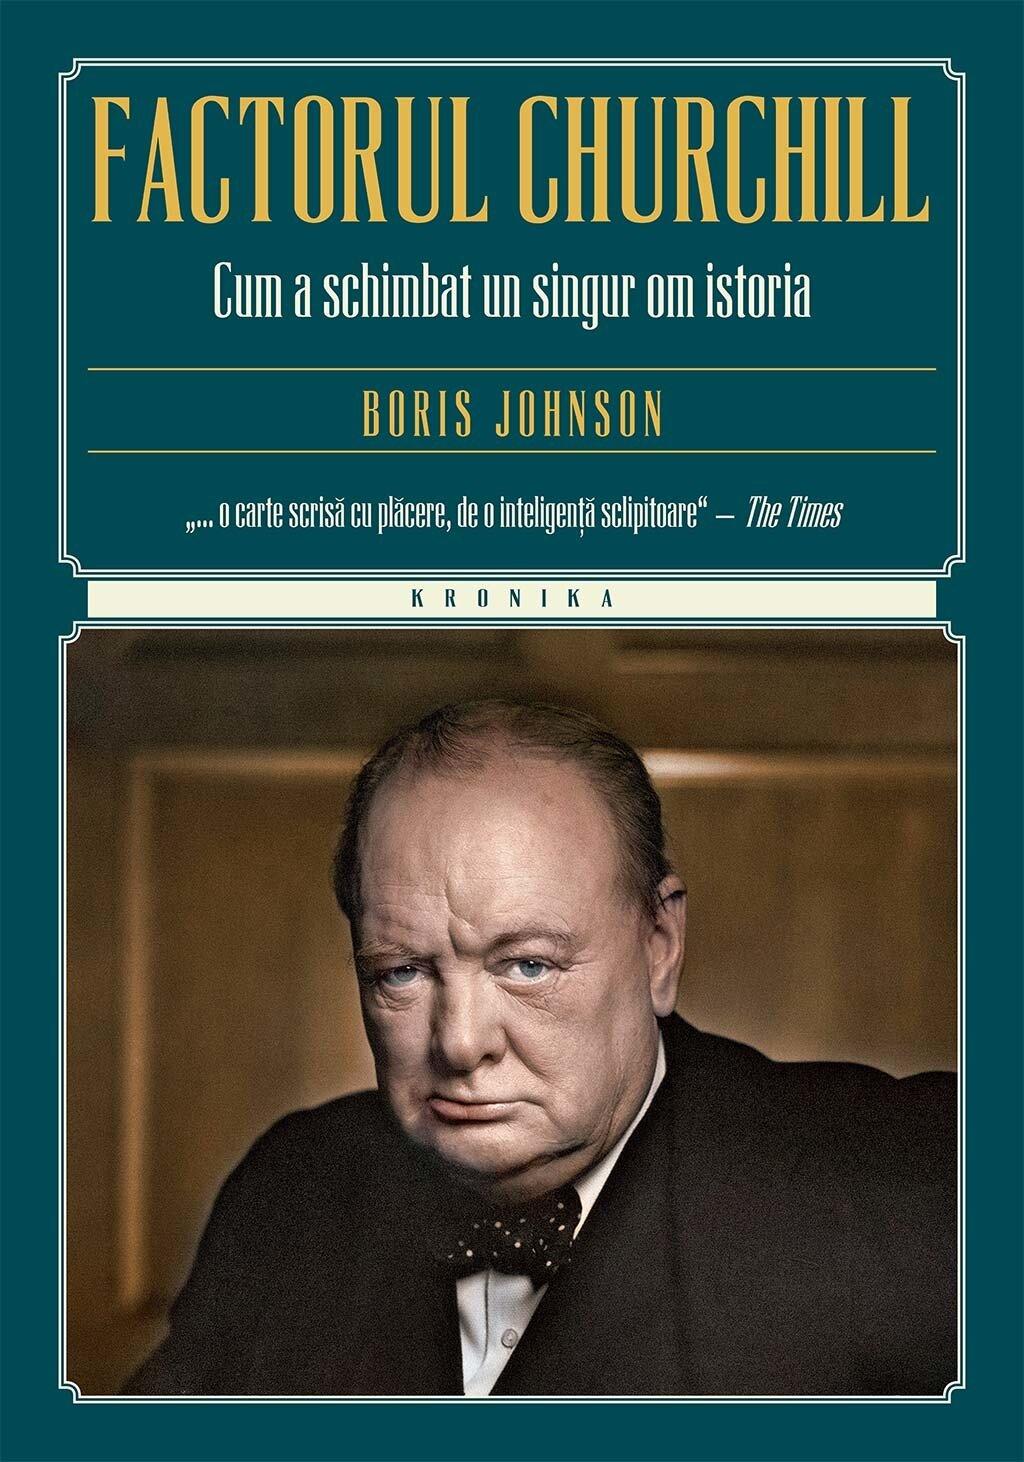 Factorul Churchill. Cum a schimbat un singur om istoria (eBook)